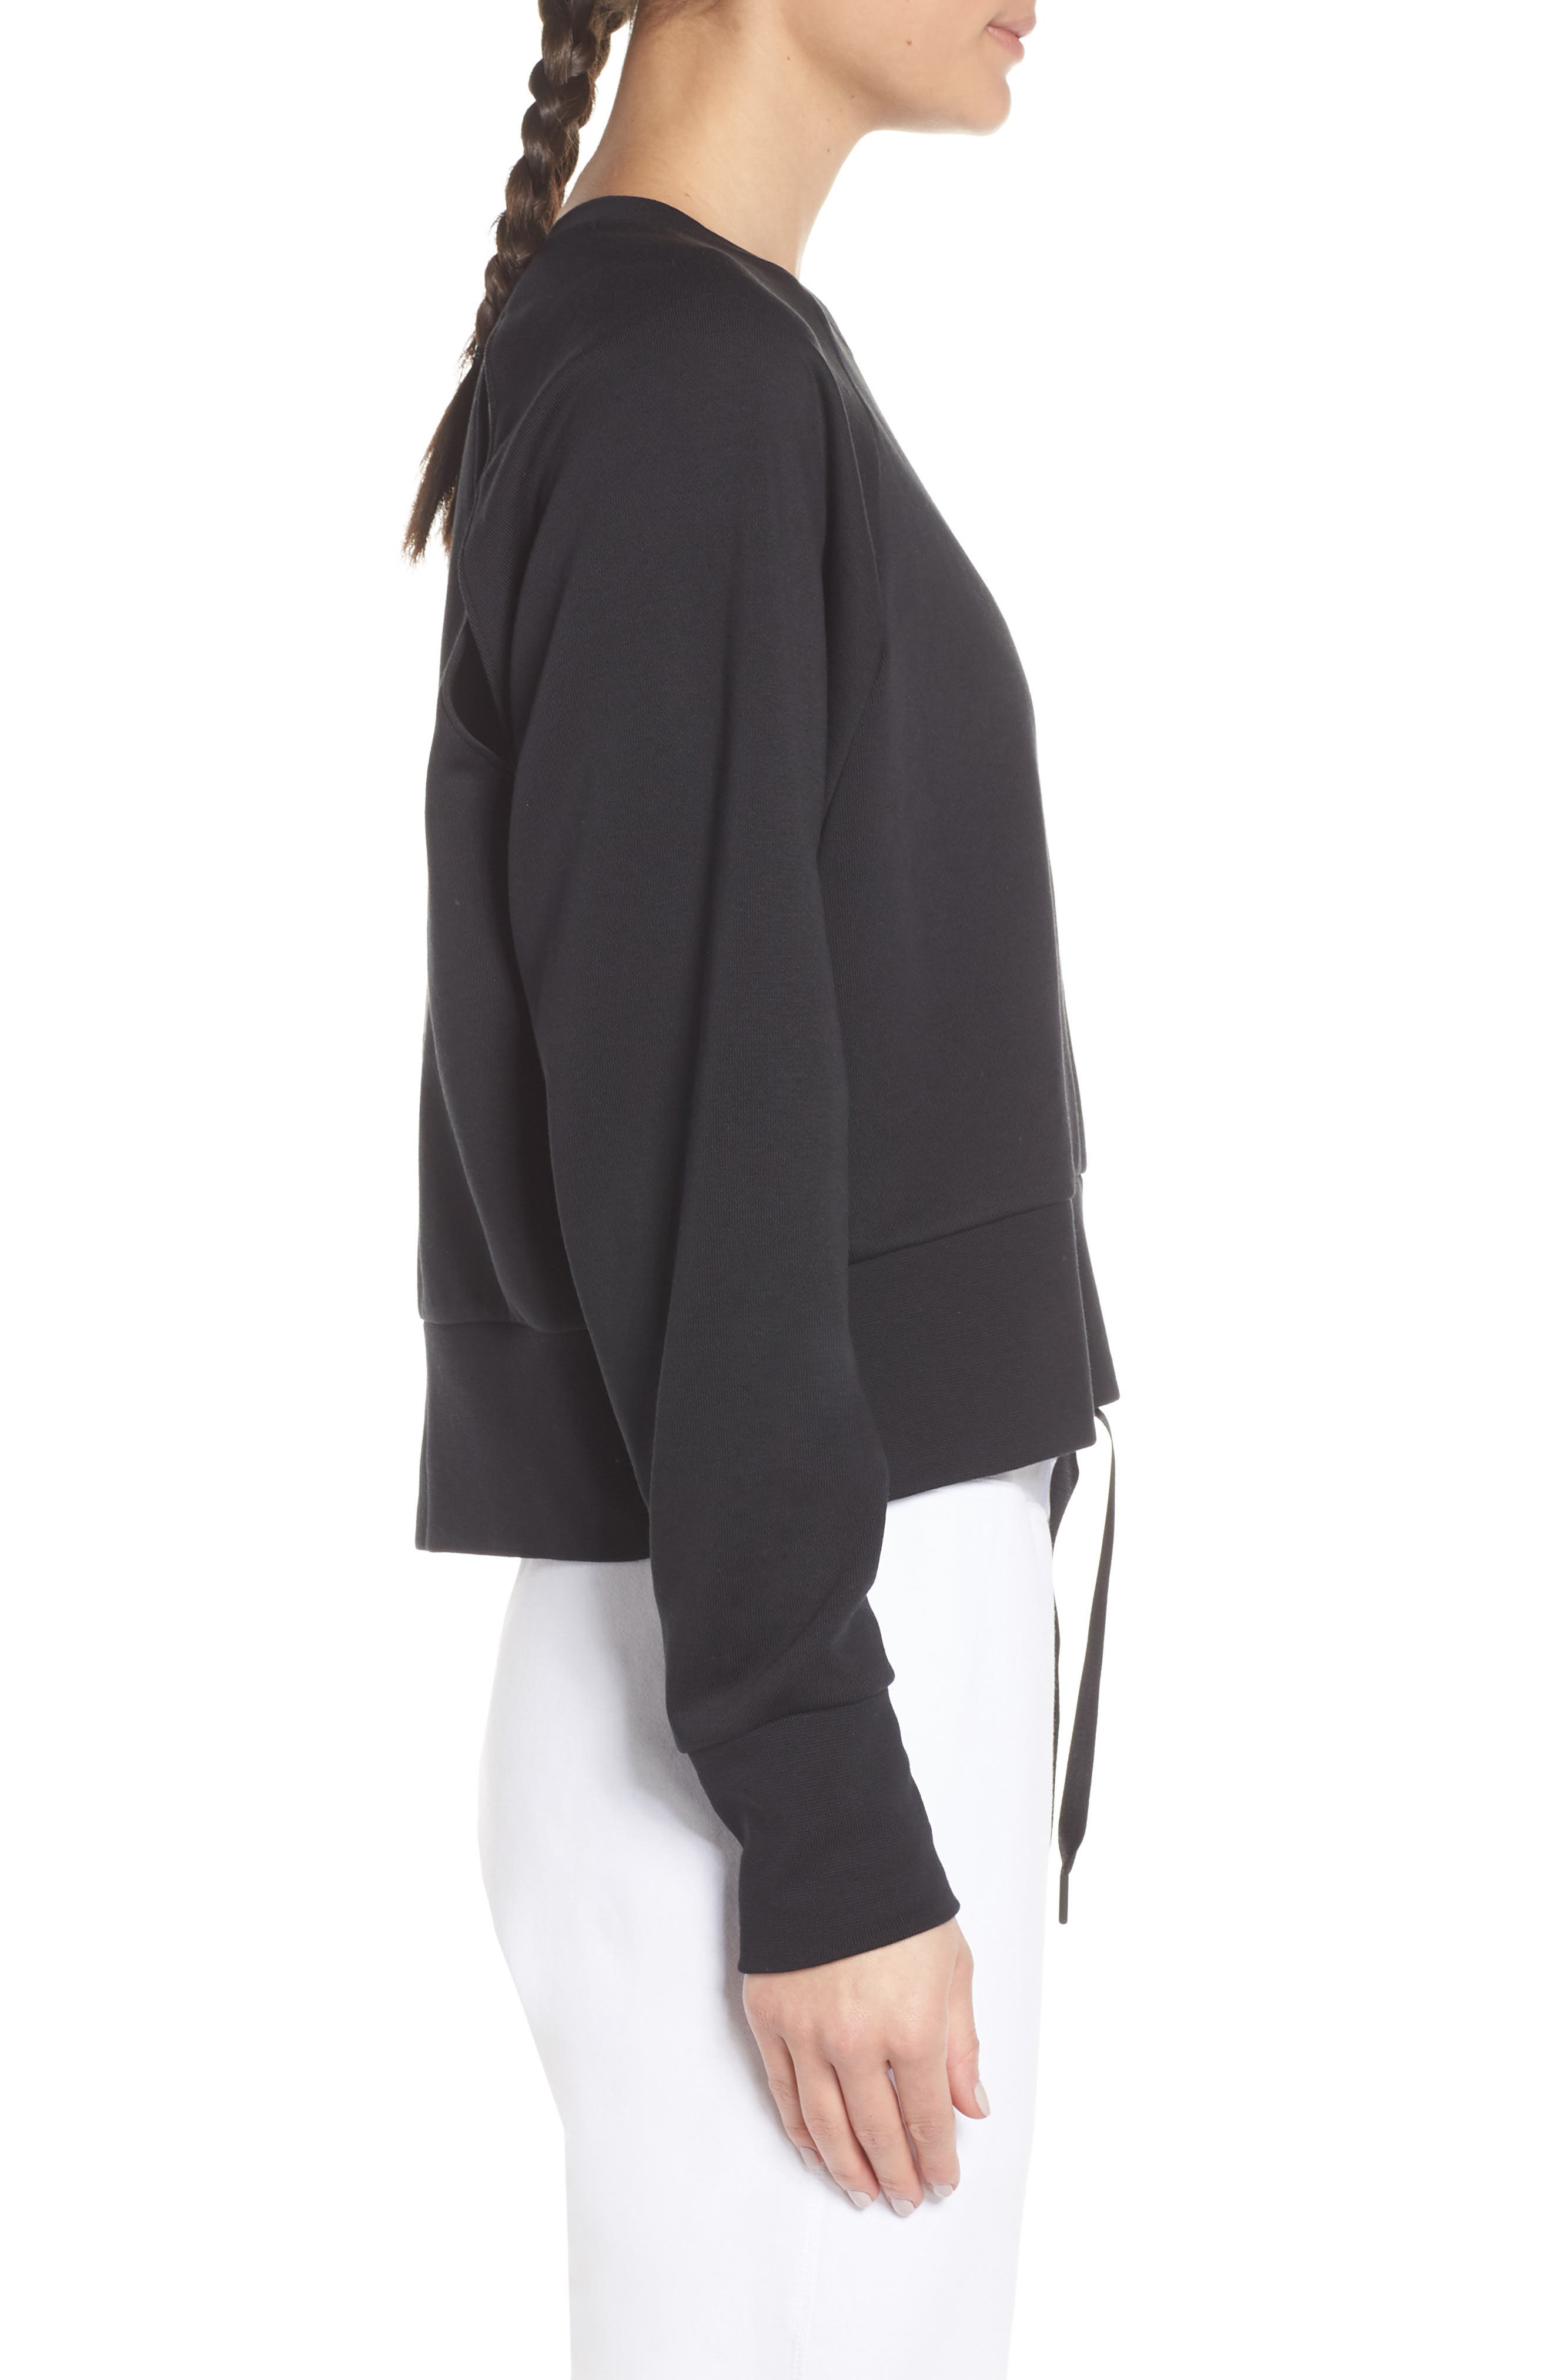 NIKE, Dry Crop Training Sweatshirt, Alternate thumbnail 4, color, BLACK/ WHITE